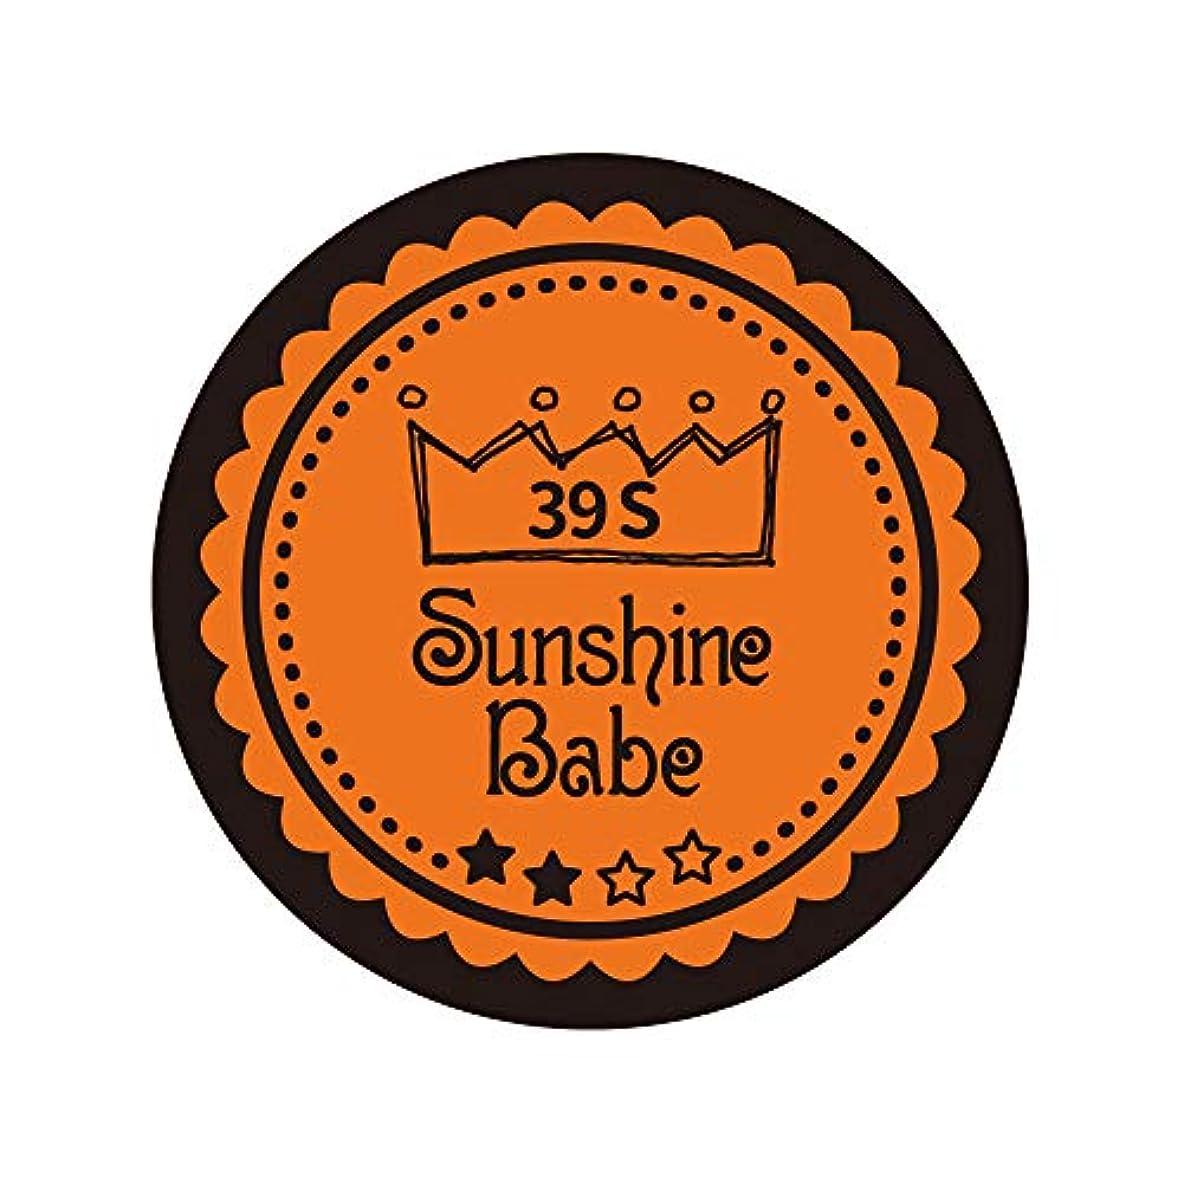 Sunshine Babe カラージェル 39S ラセットオレンジ 4g UV/LED対応